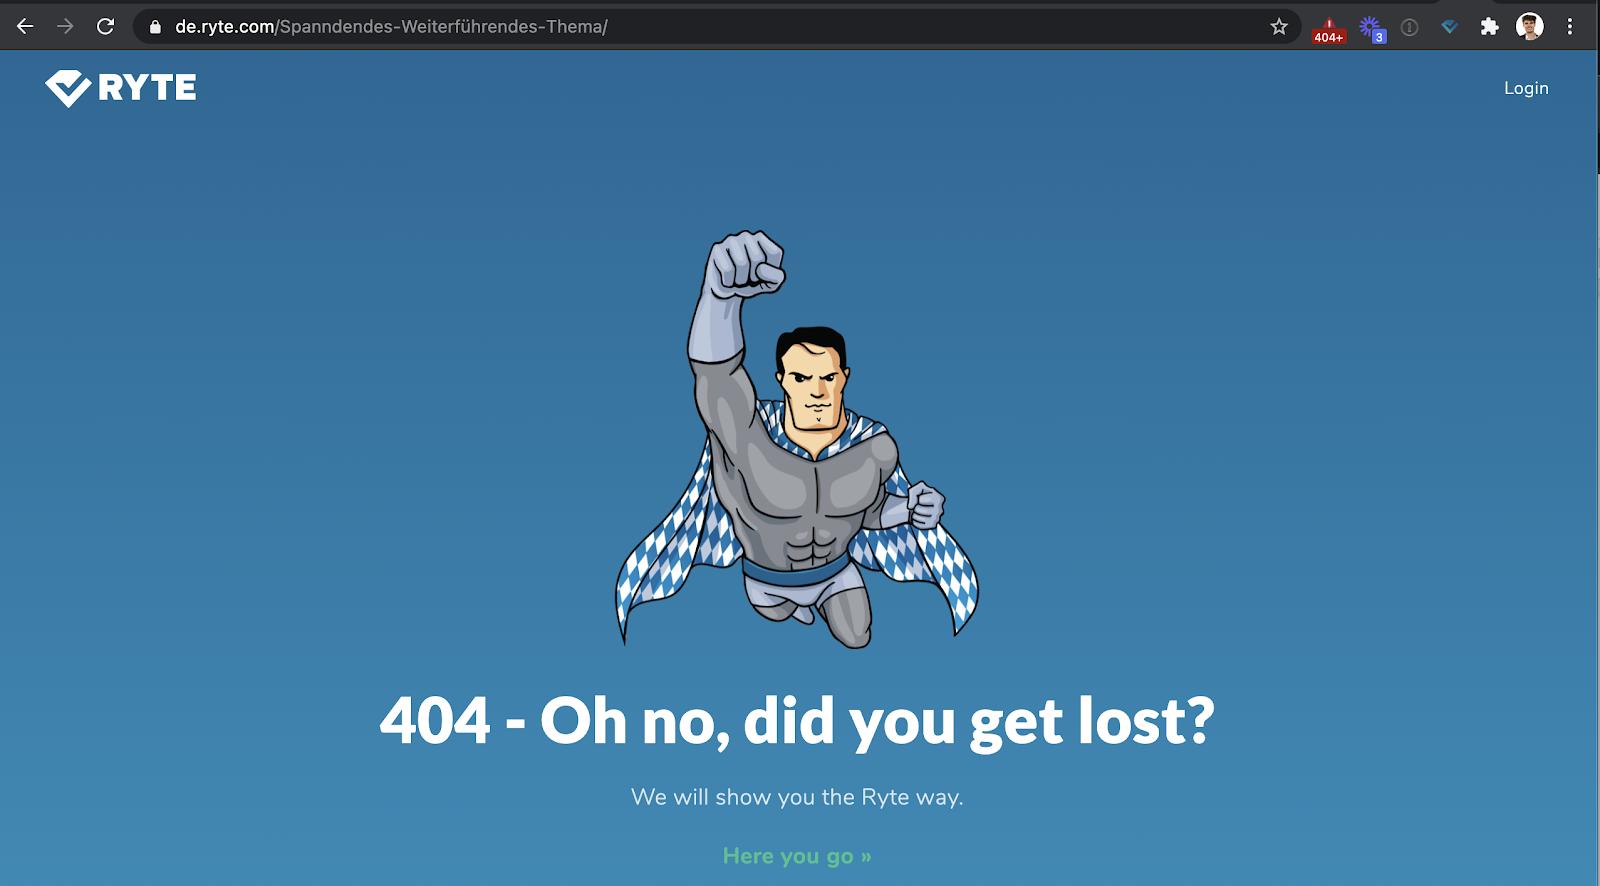 404-Fehlerseite